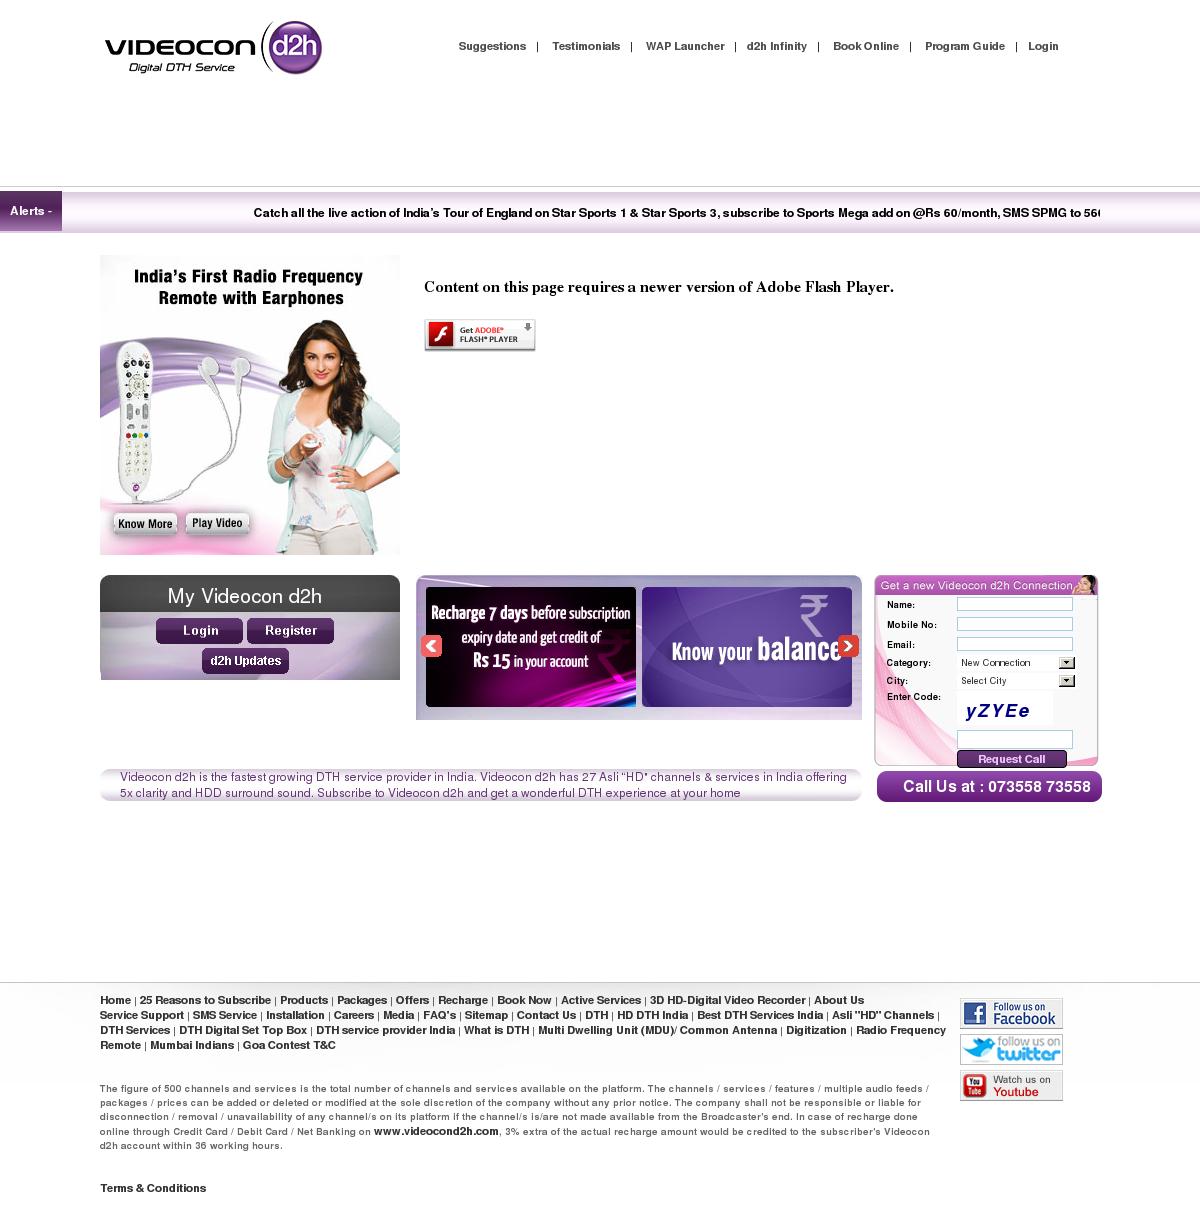 Videocon d2h Competitors, Revenue and Employees - Owler Company Profile